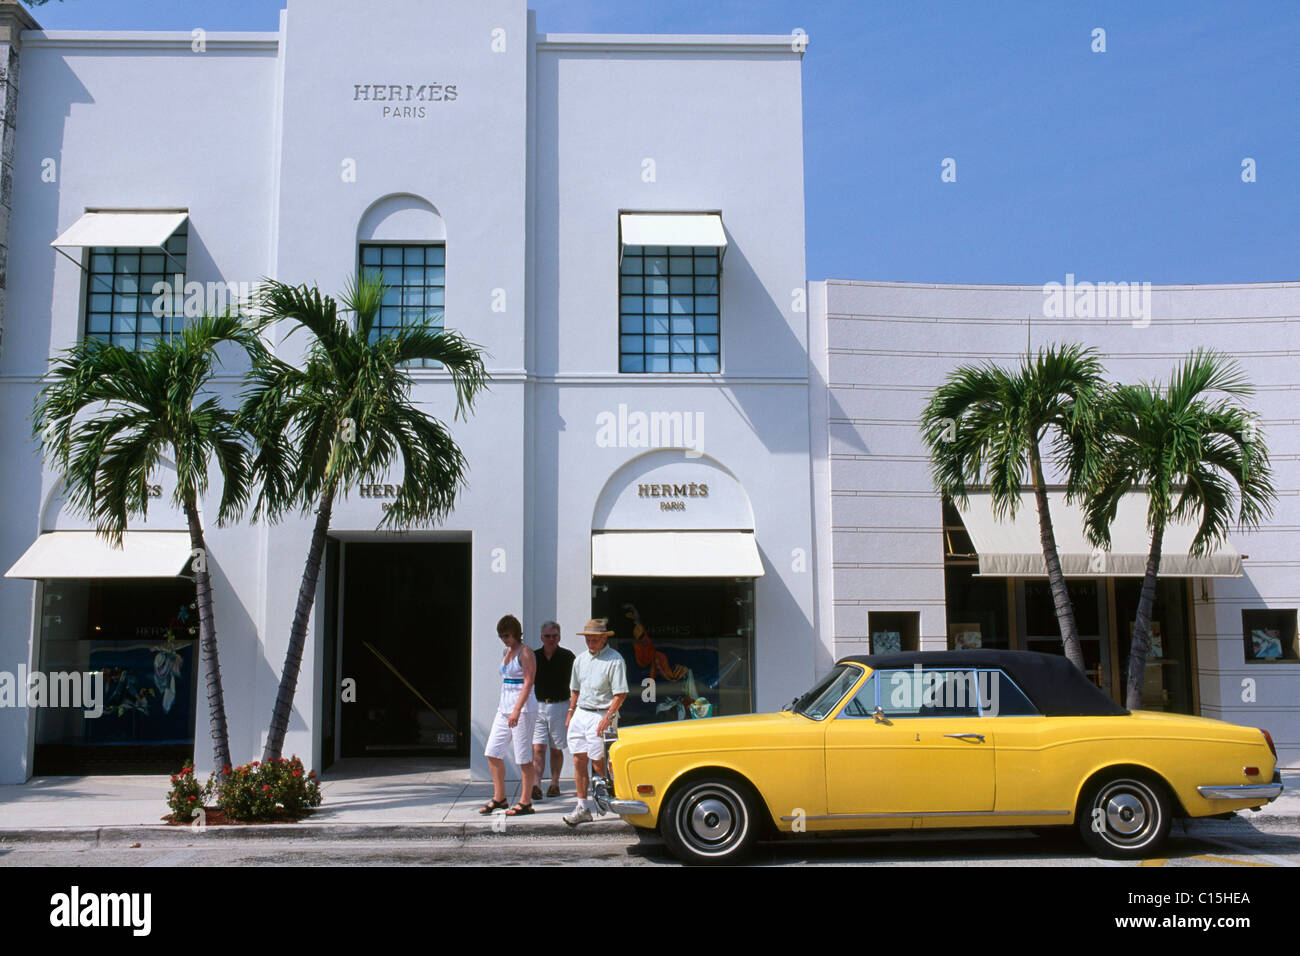 Hermes boutique, shopping district, Palm Beach, Florida, USA Stock Photo